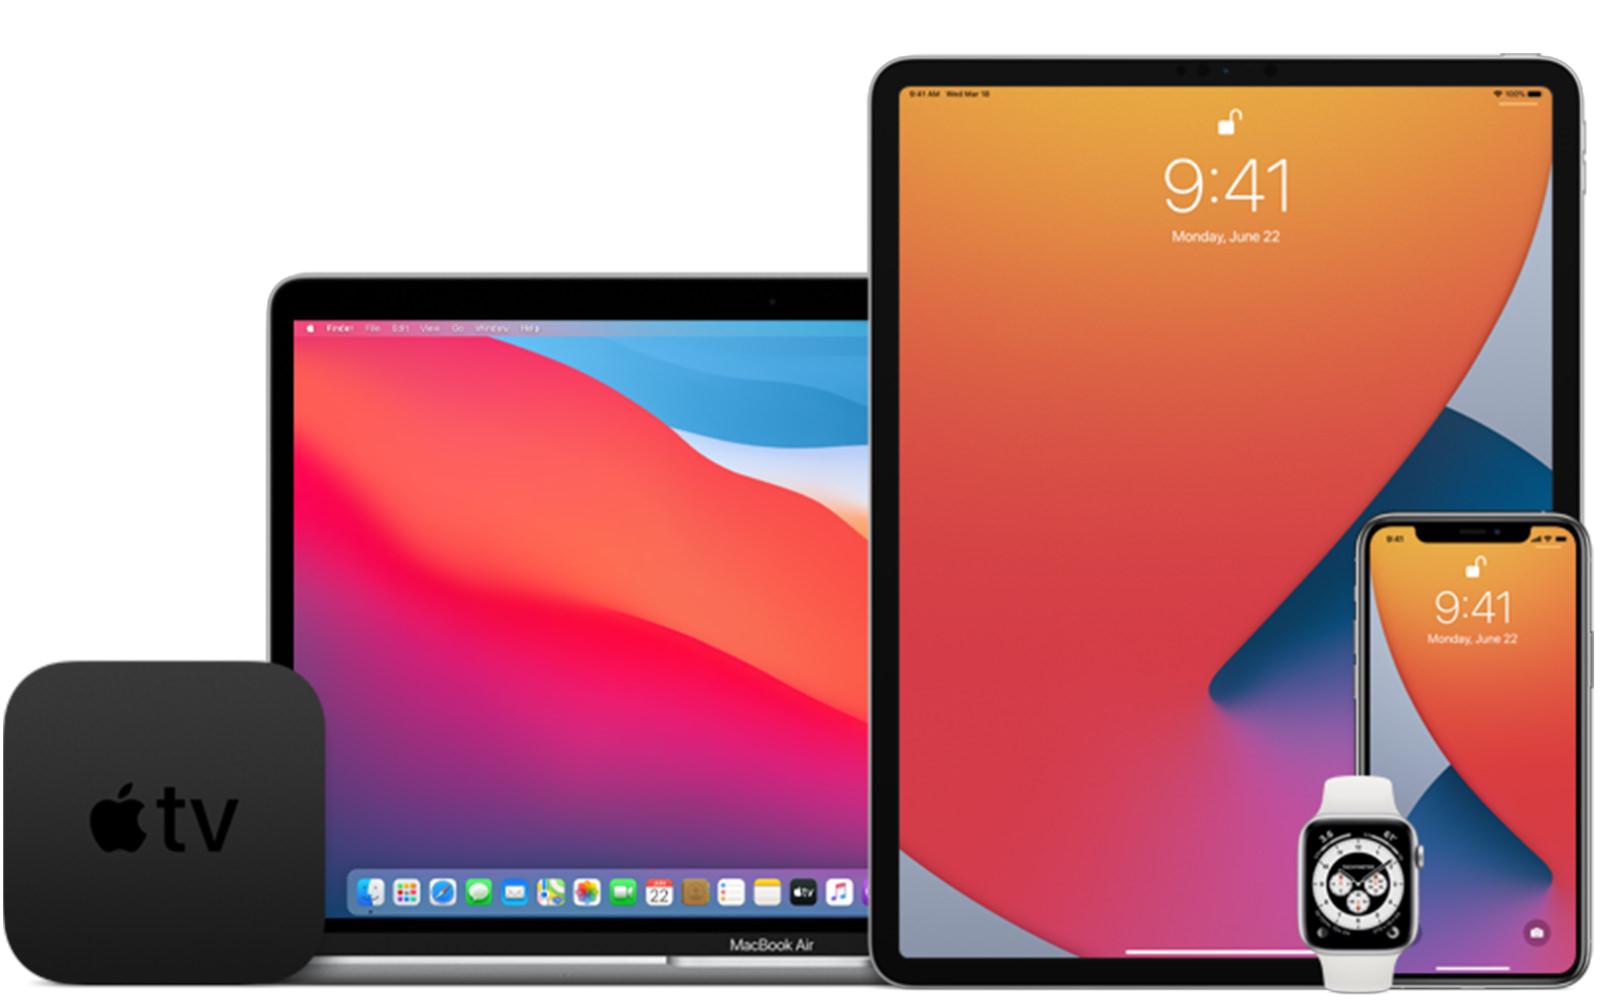 IOS14 macOSBigSur Public Beta